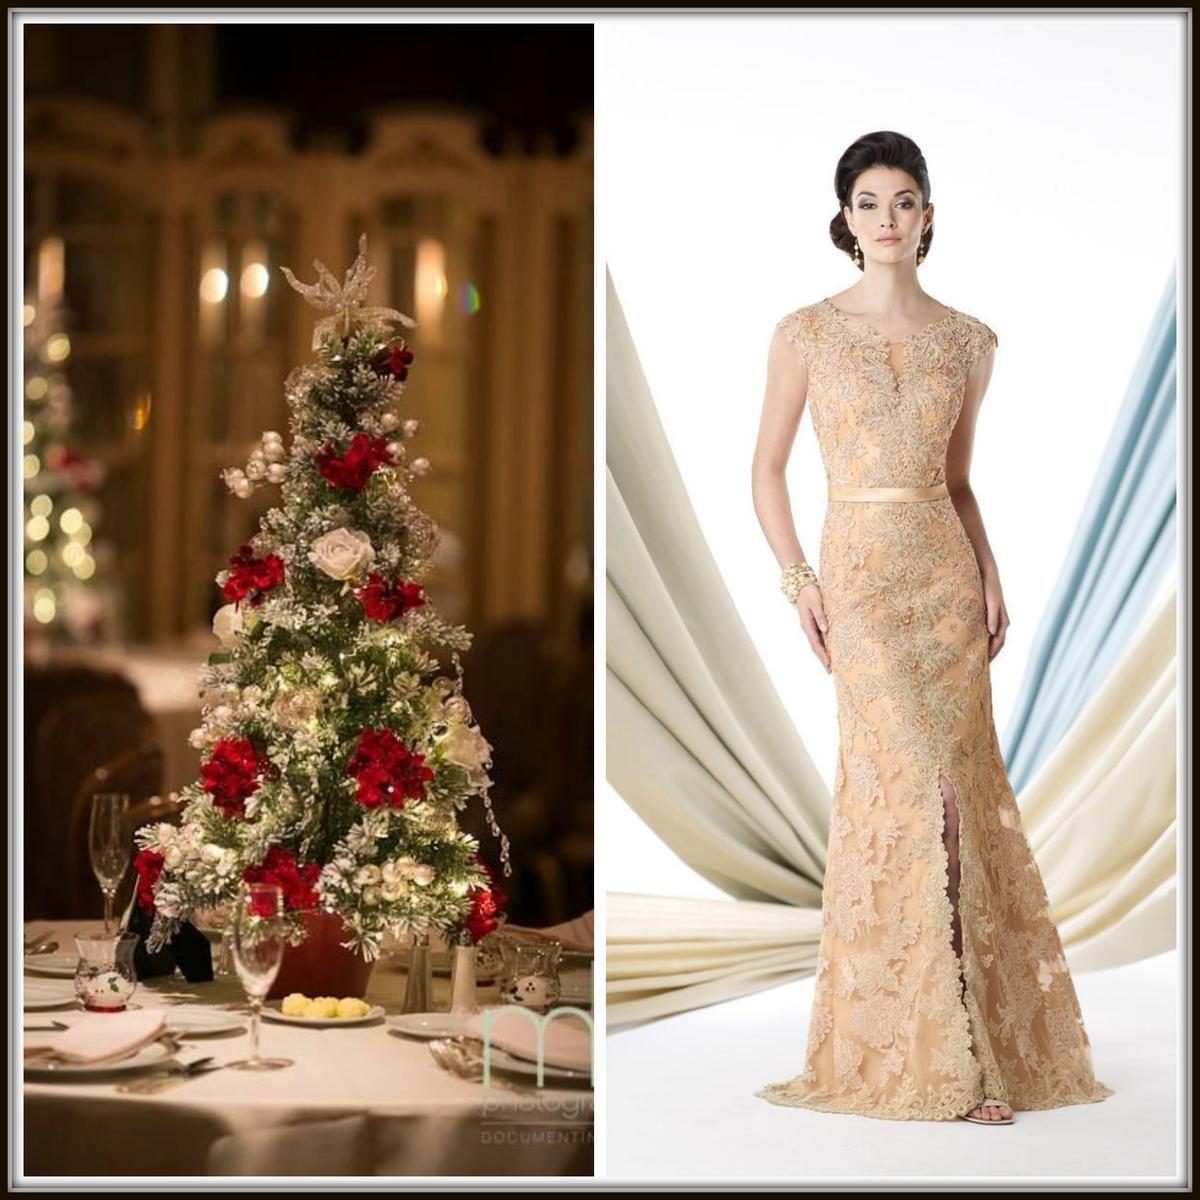 Wedding Gowns Houston Tx: MOB / MOG Ideas Mother Of The Bride, Houston TX, T Carolyn